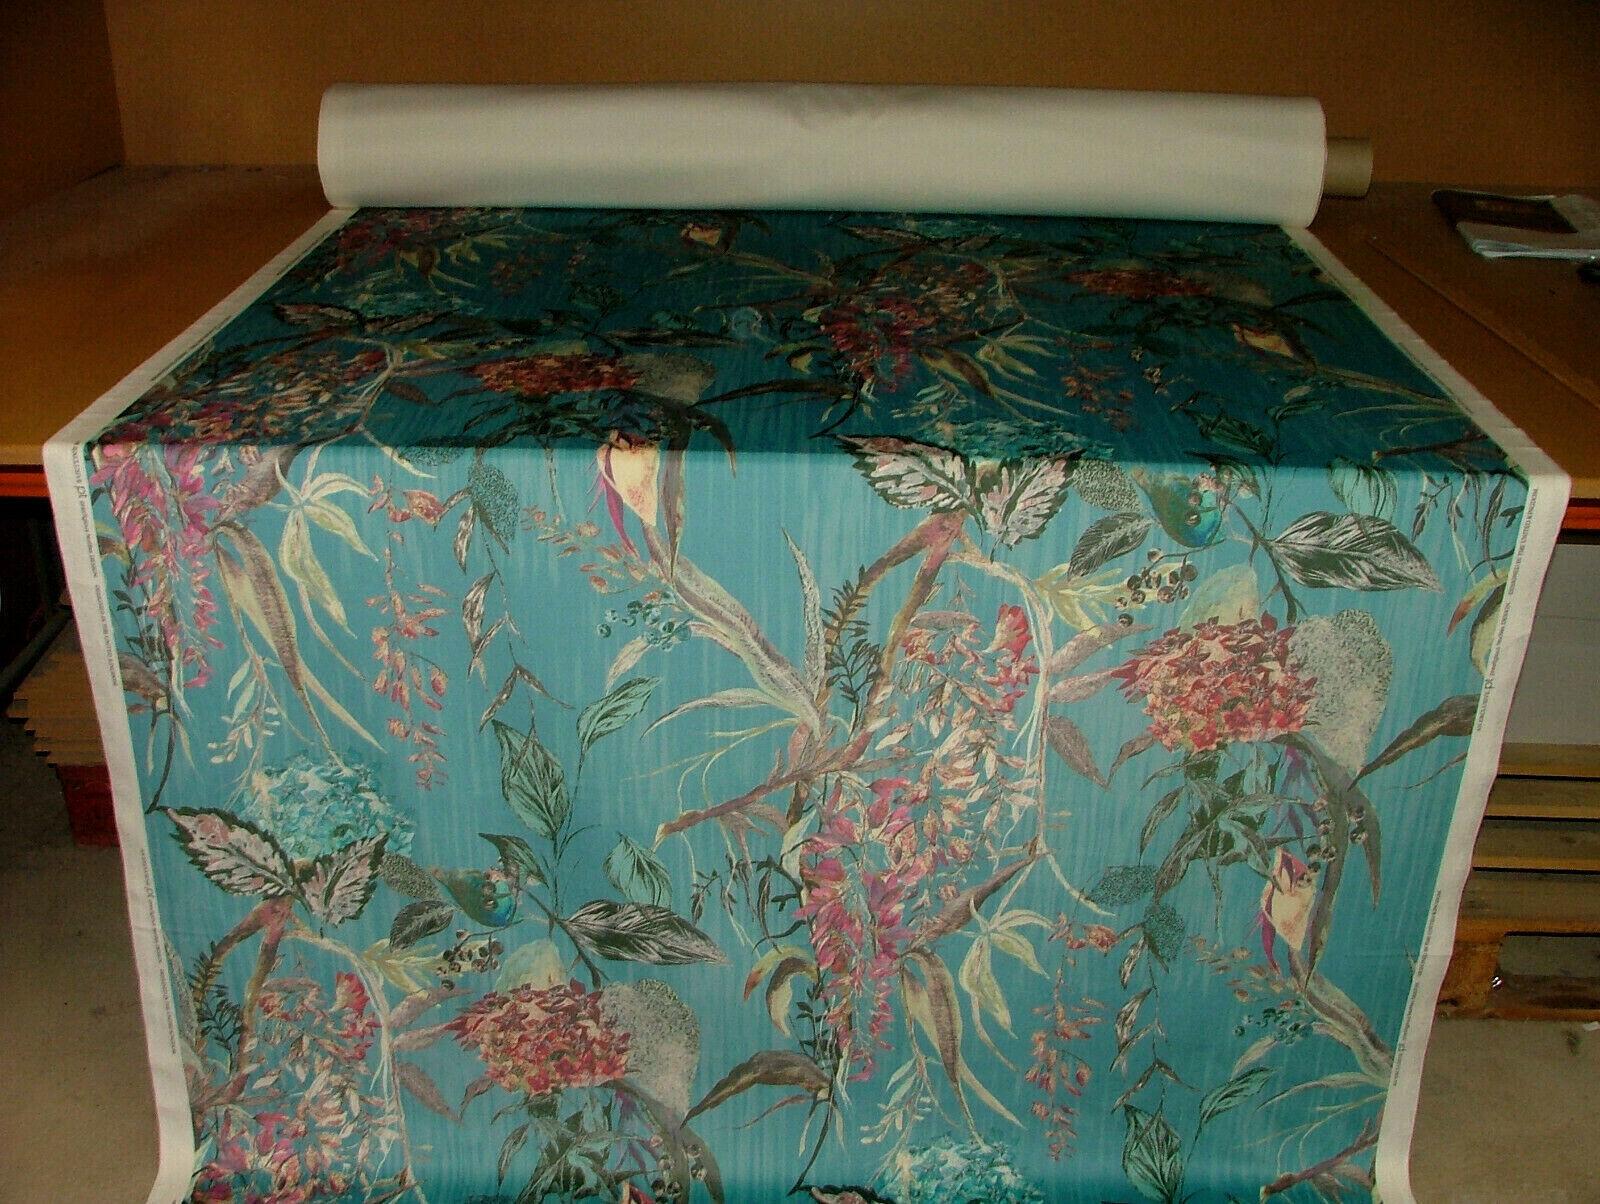 Botanist Plants Peacock Botanical Curtain Upholstery Cushion Plush Velvet Fabric